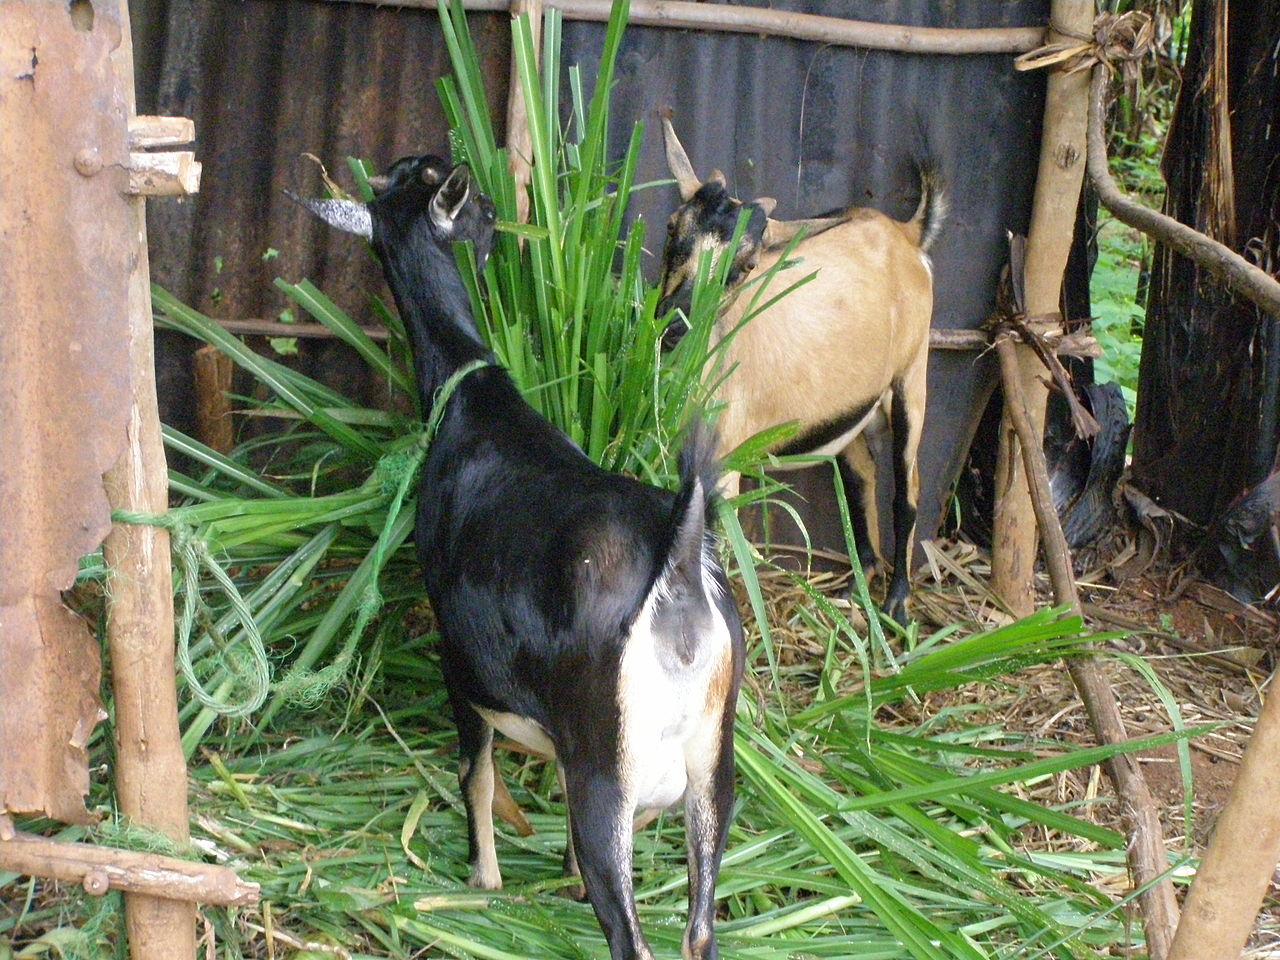 Farm cooperative